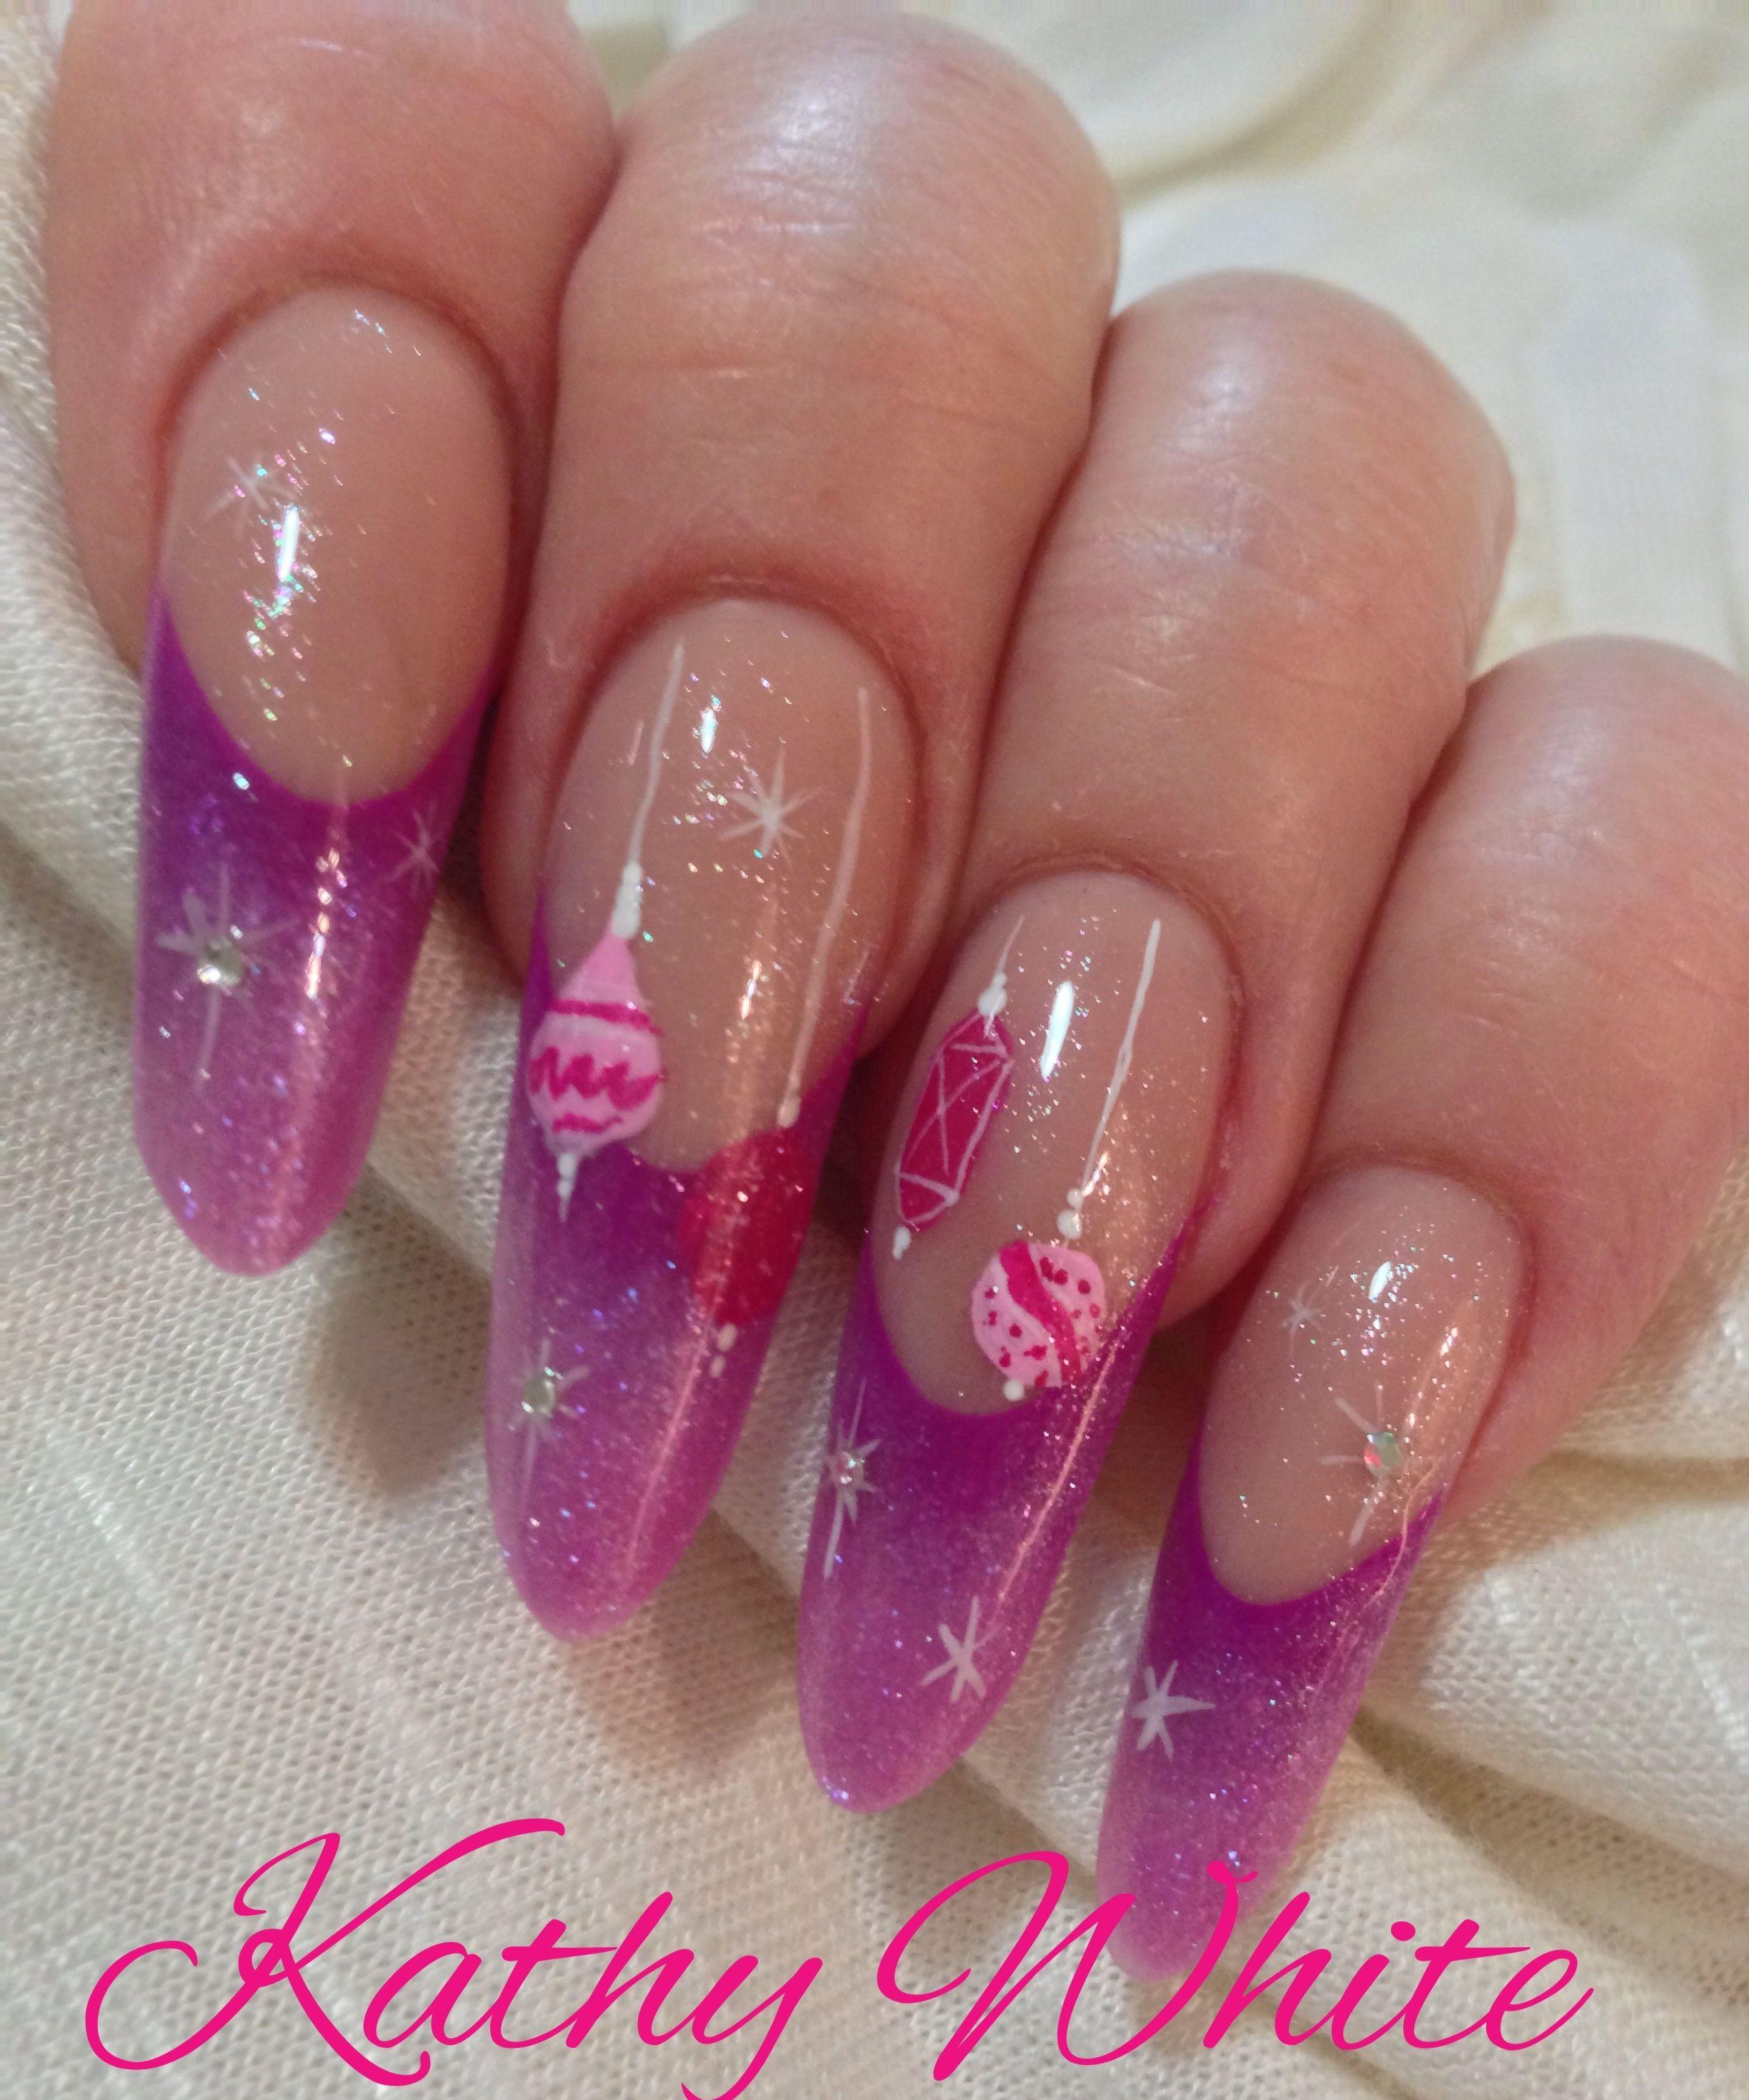 Acrylic Purple Nails With Pink Christmas Nail Art